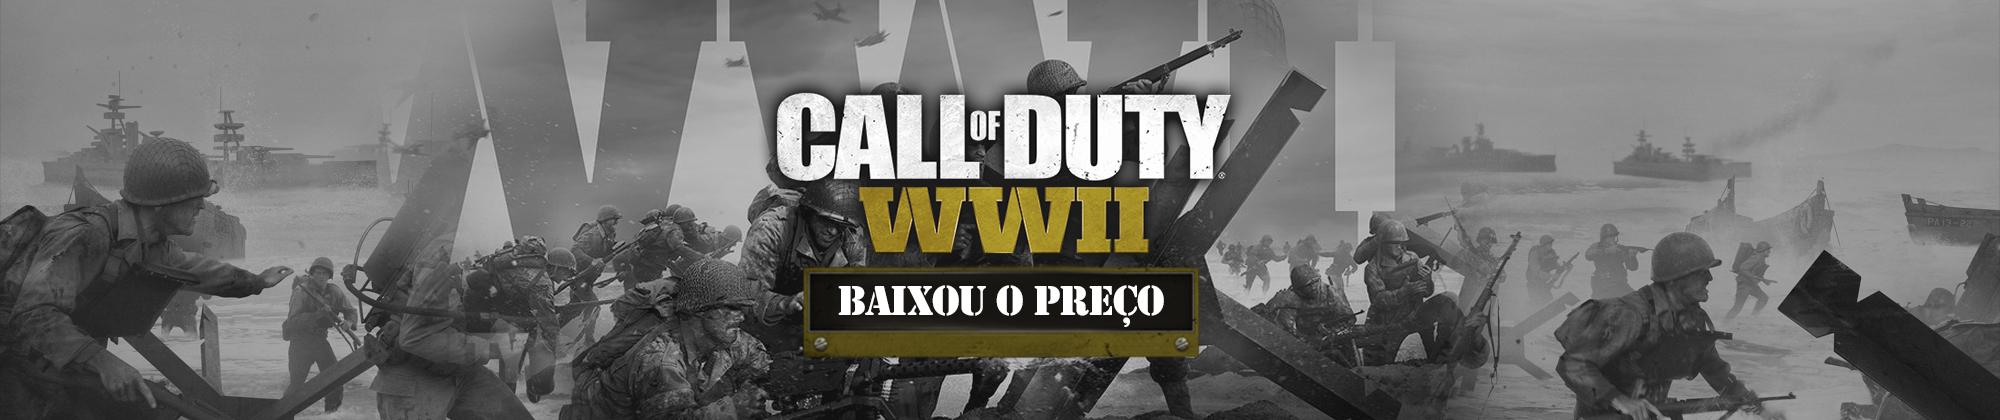 COD WWII - BAIXOU O PREÇO